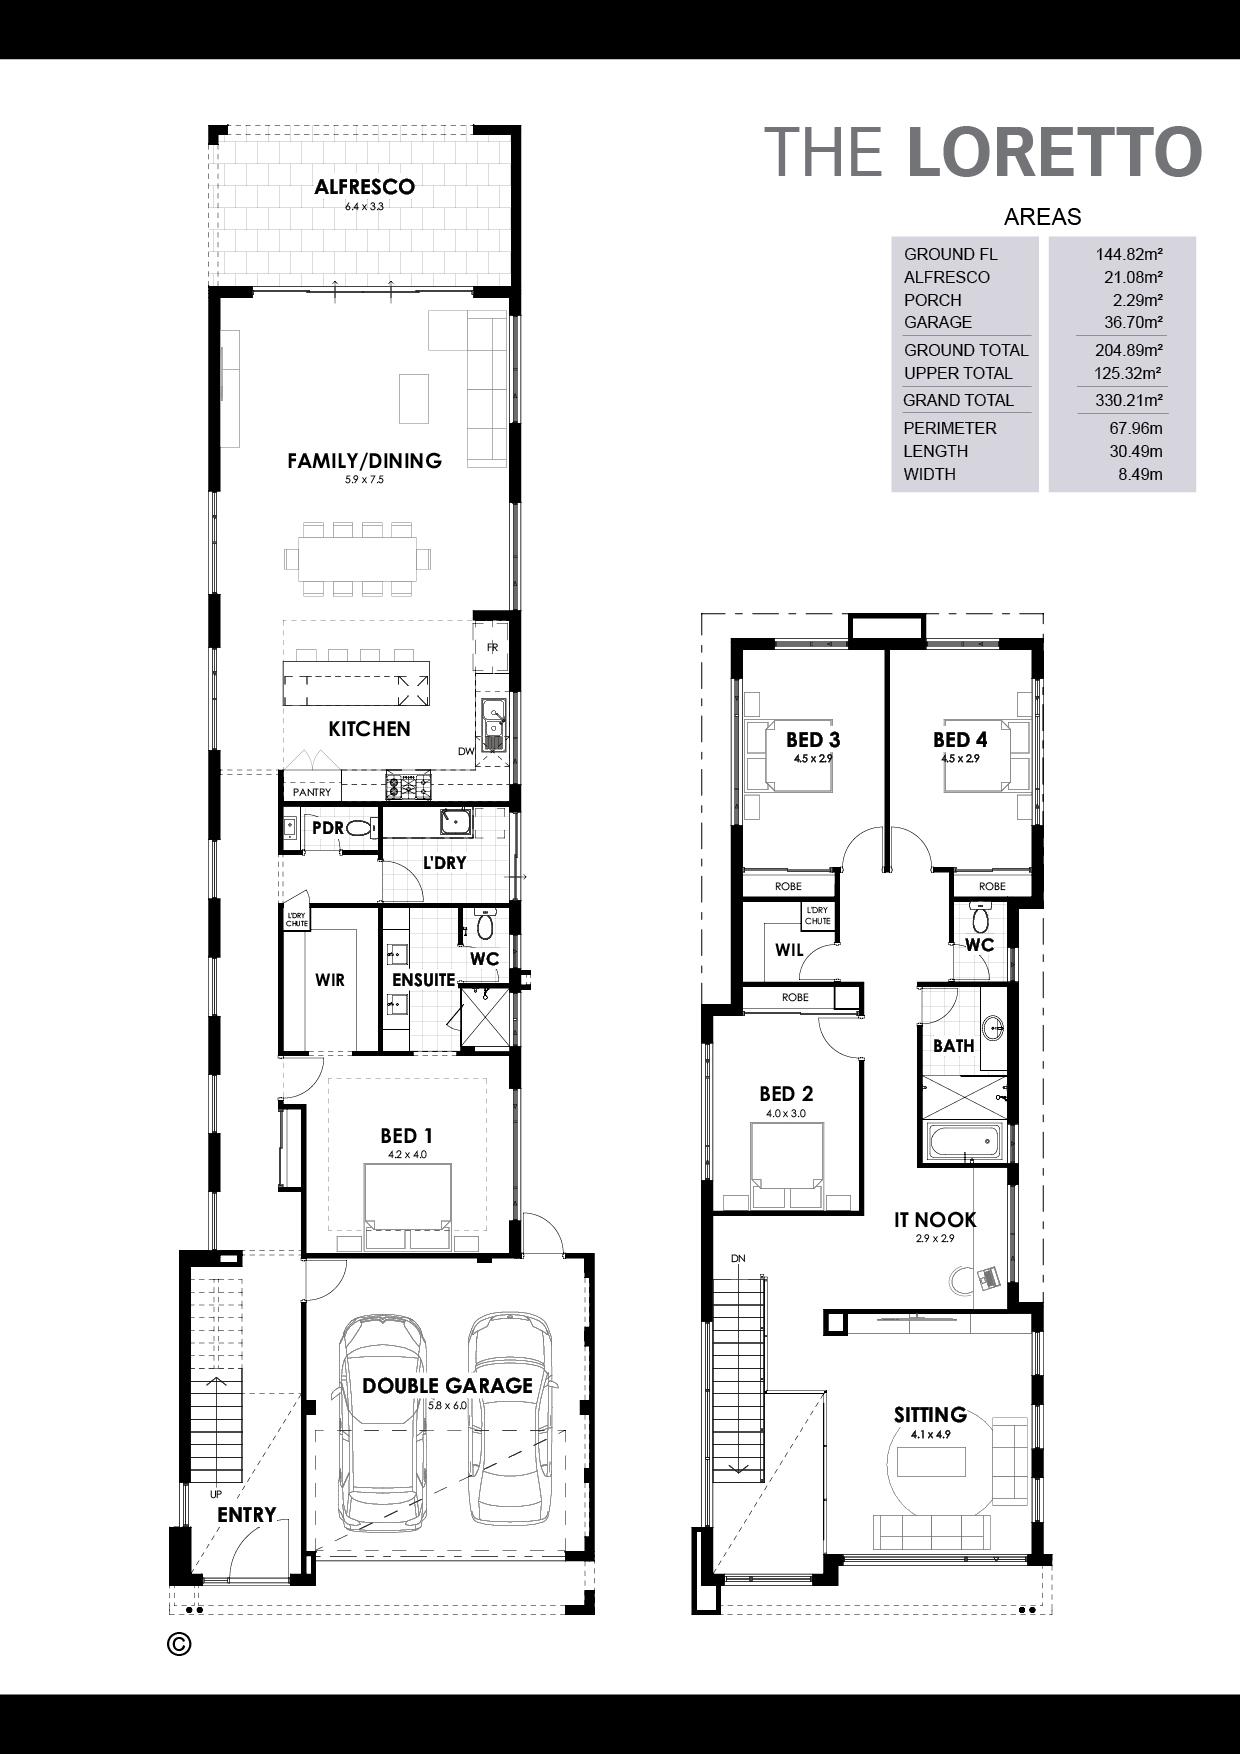 The Loretto Floorplan